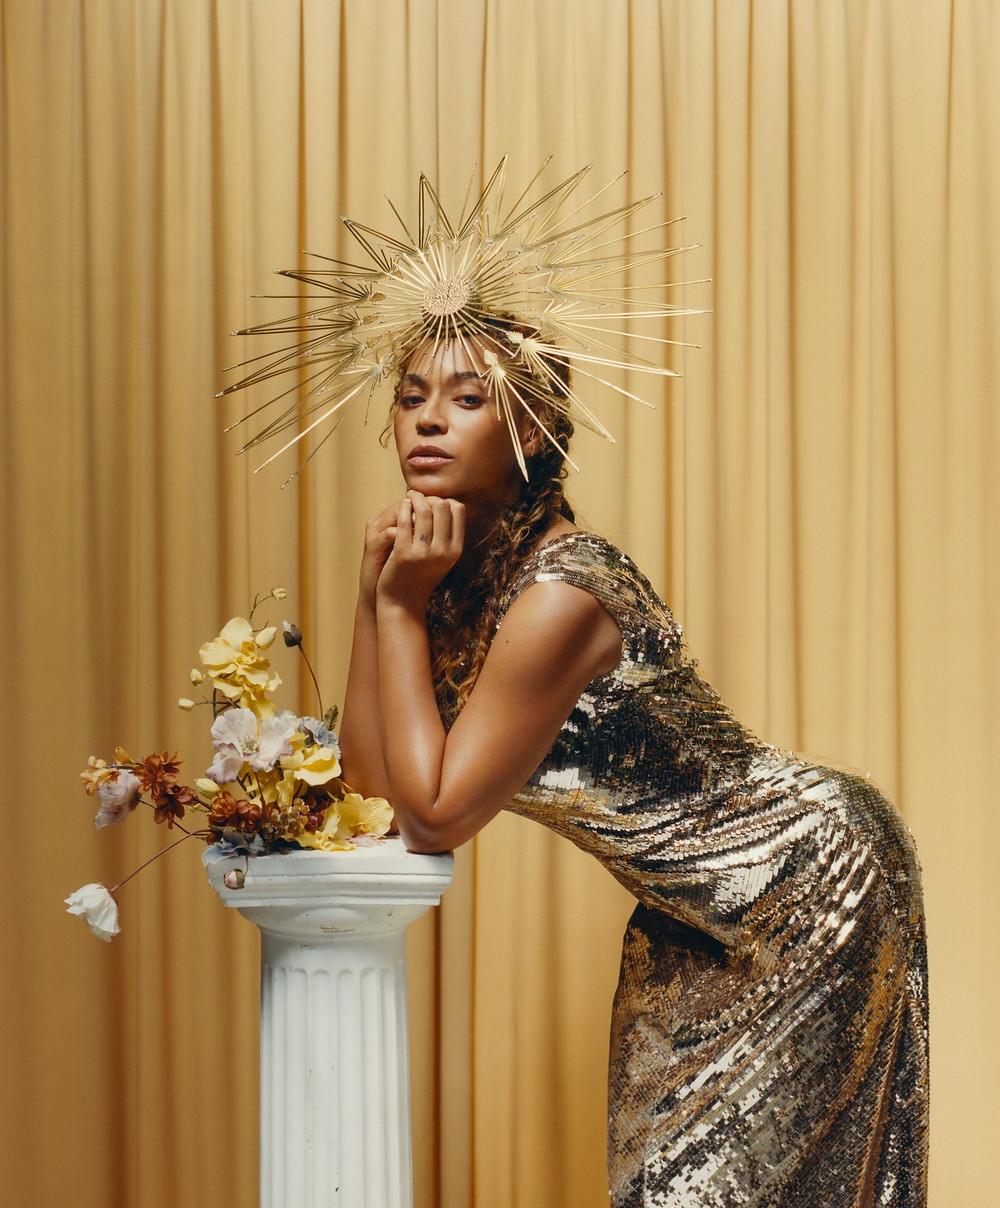 Beyoncé, September 2018 by Tyler Mitchell, © Vogue